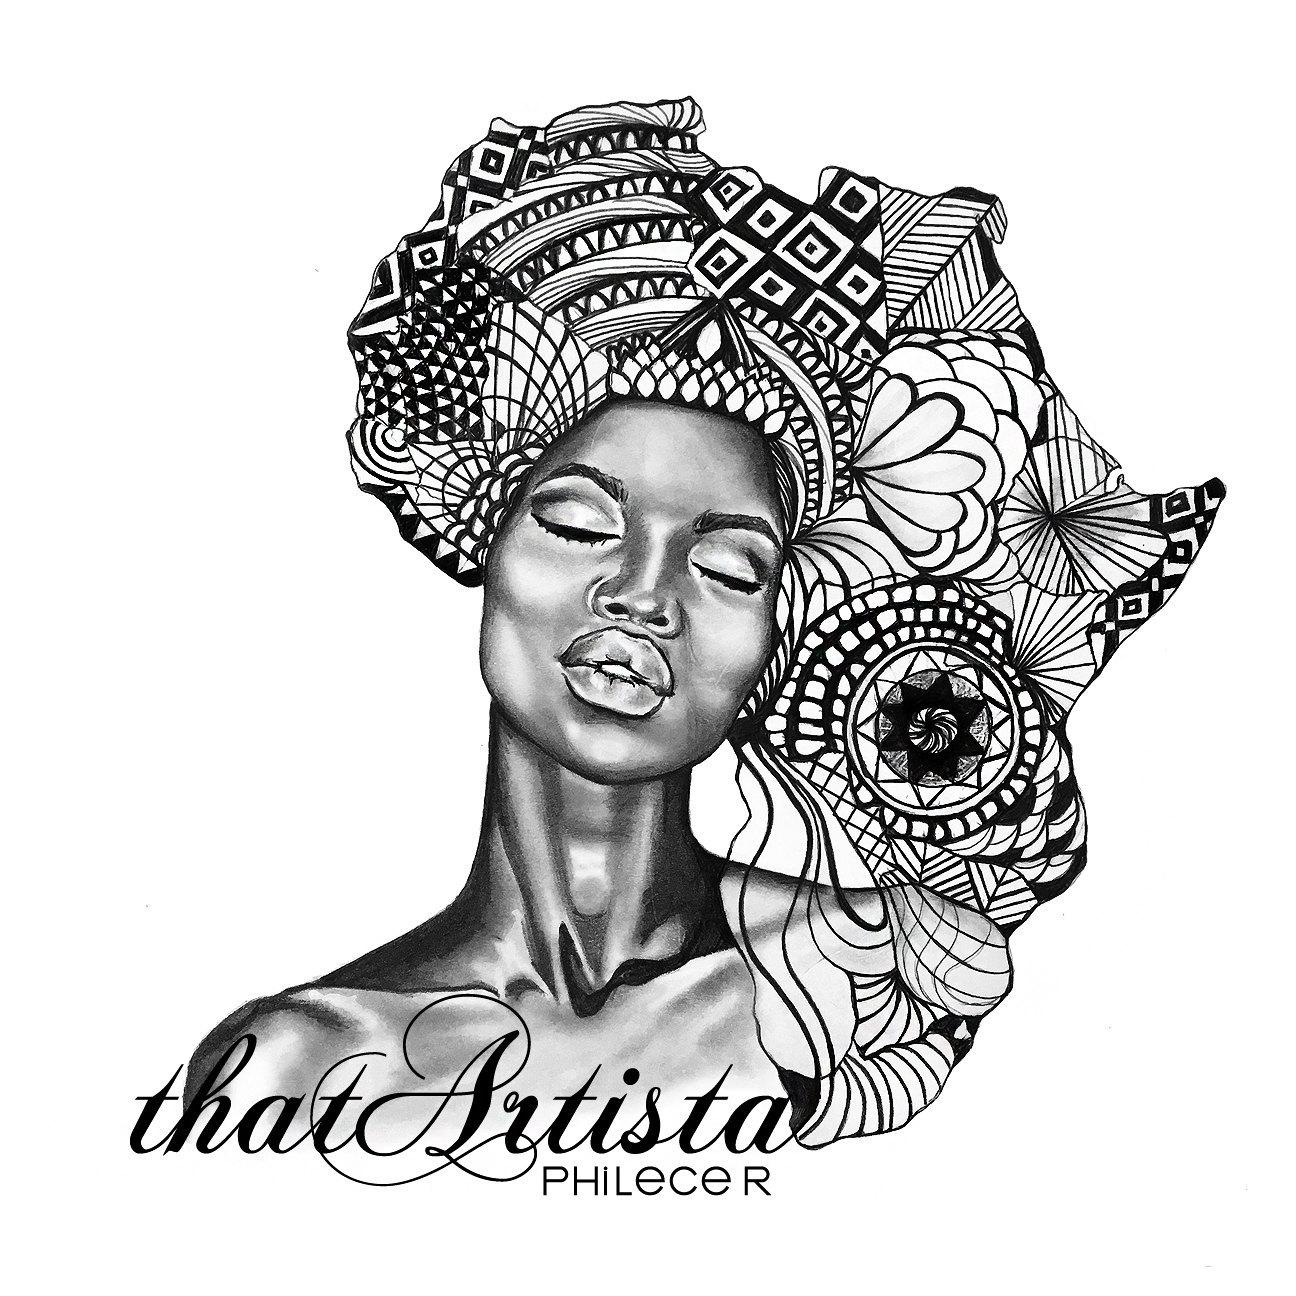 красная картинки африканки в векторе стиле прованс